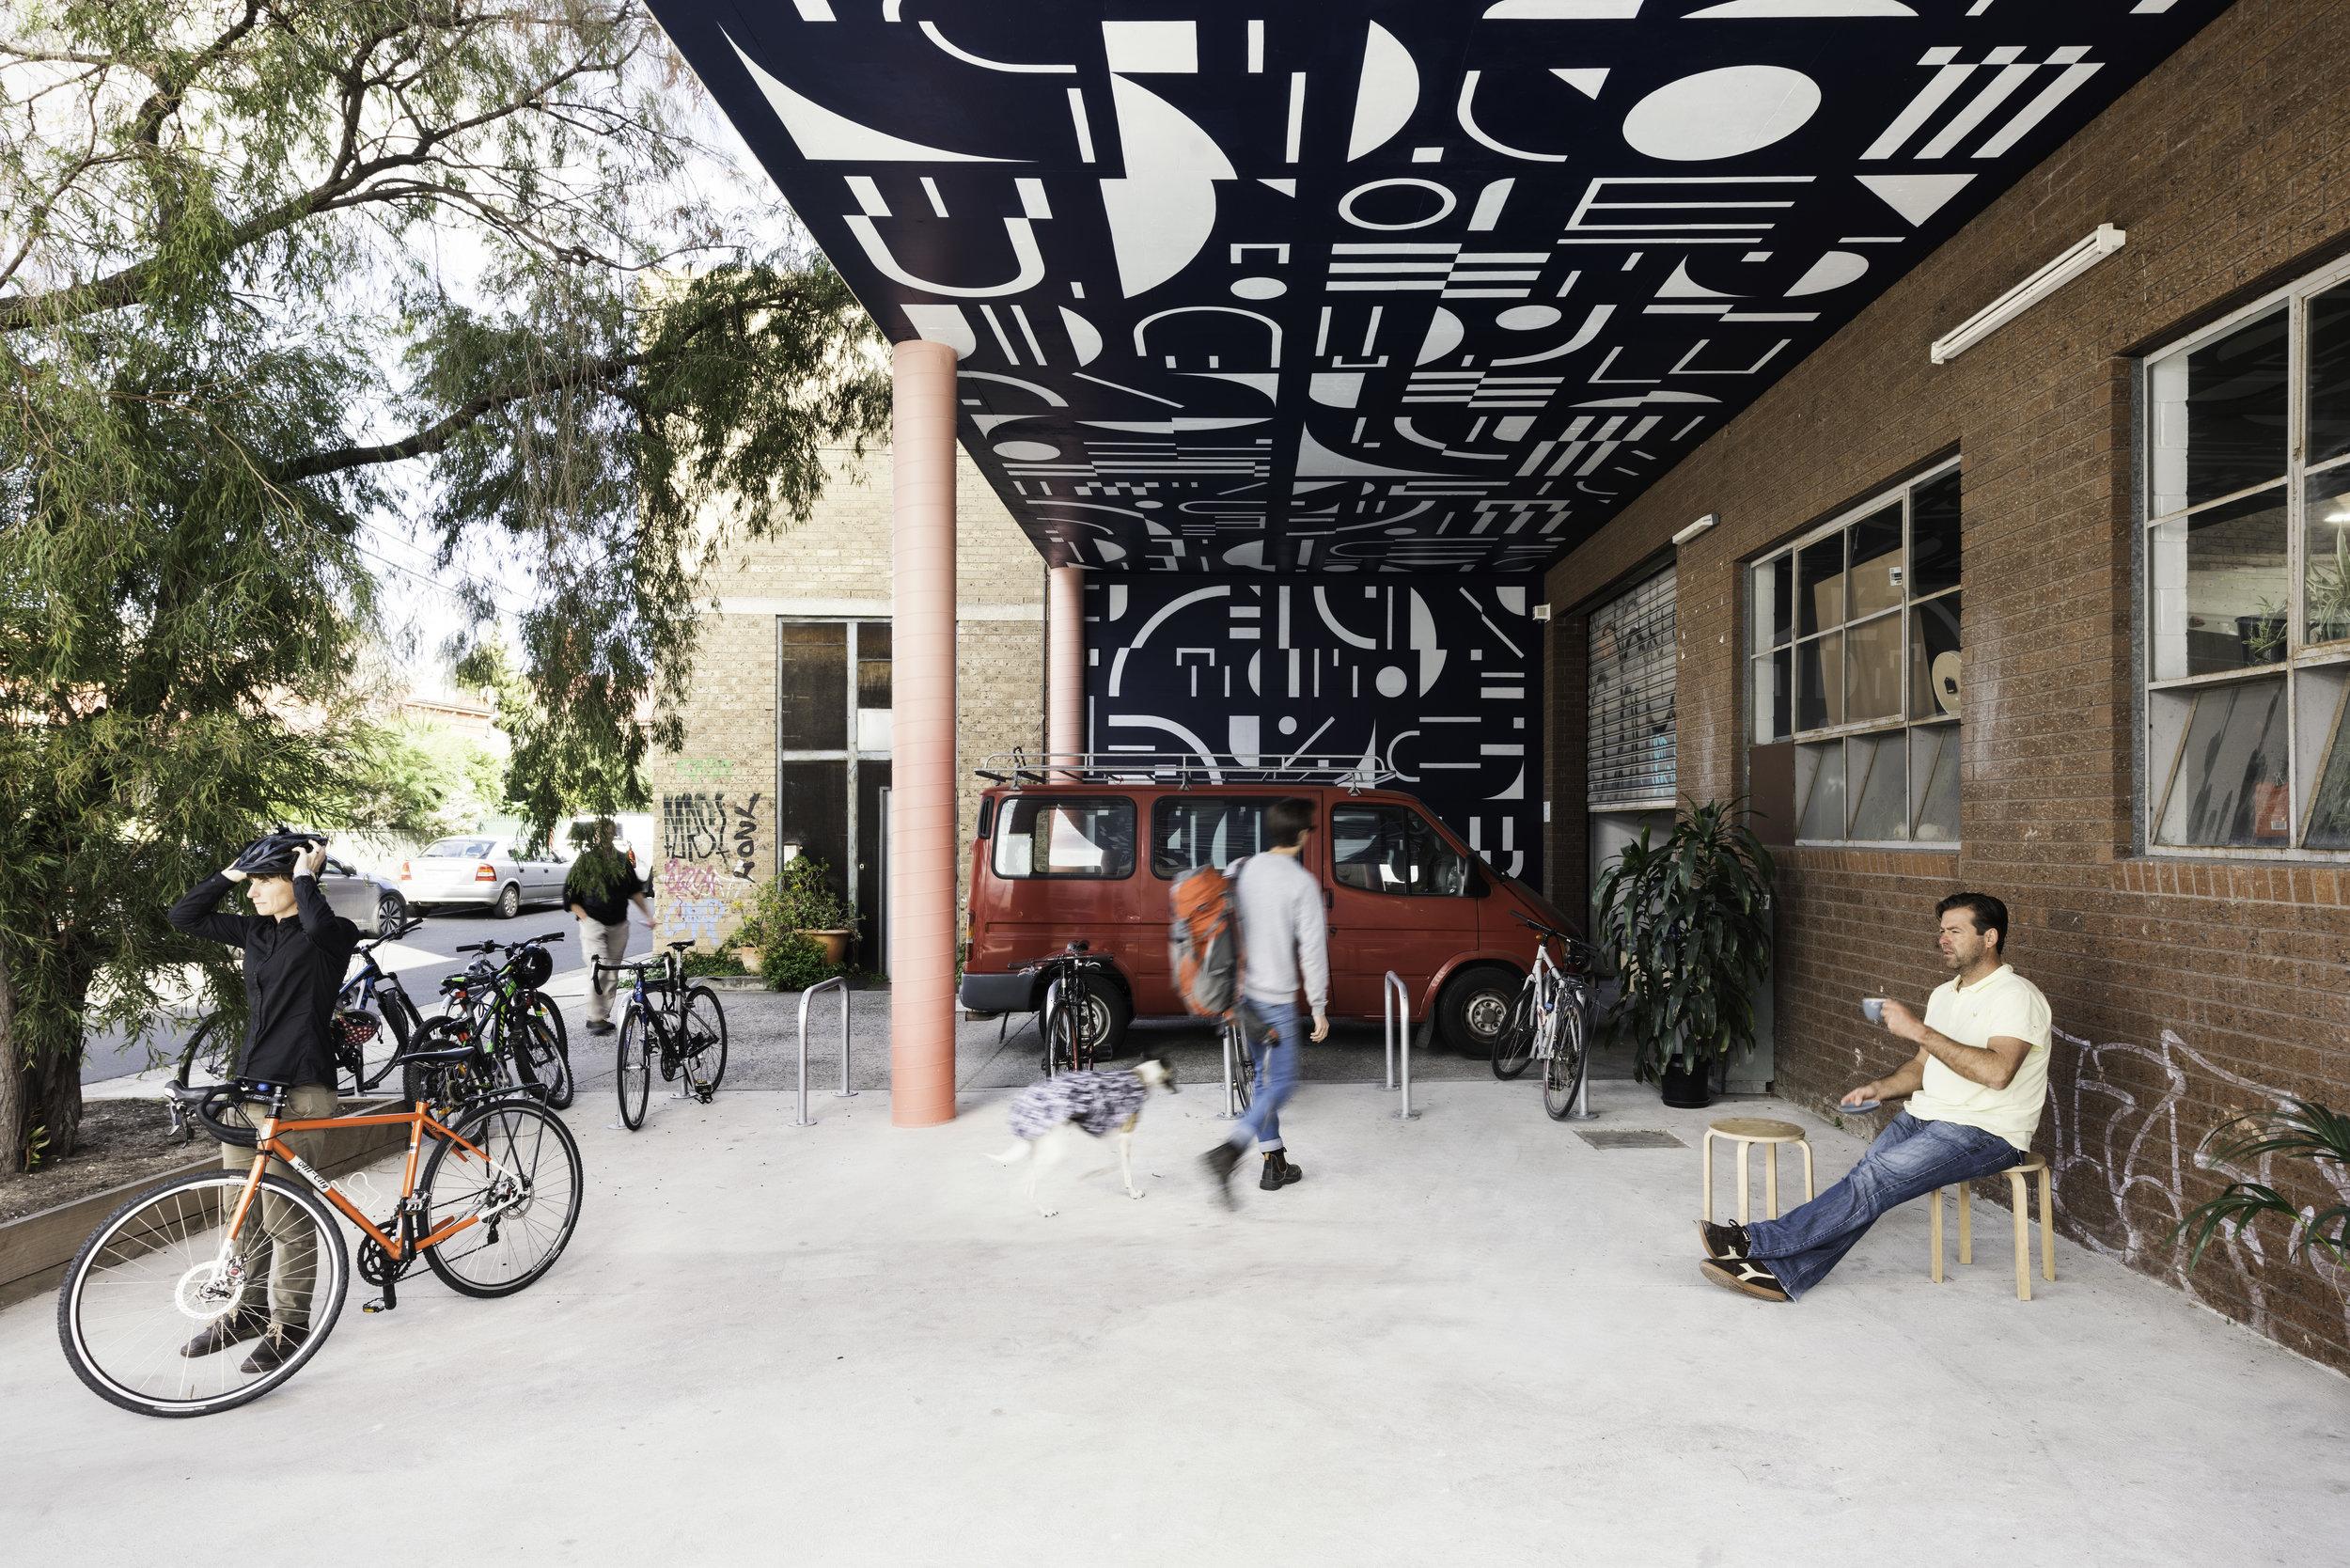 Green Sheep Collective patio landscape architecture mural graffiti urban design public life green sustainalbe .jpg